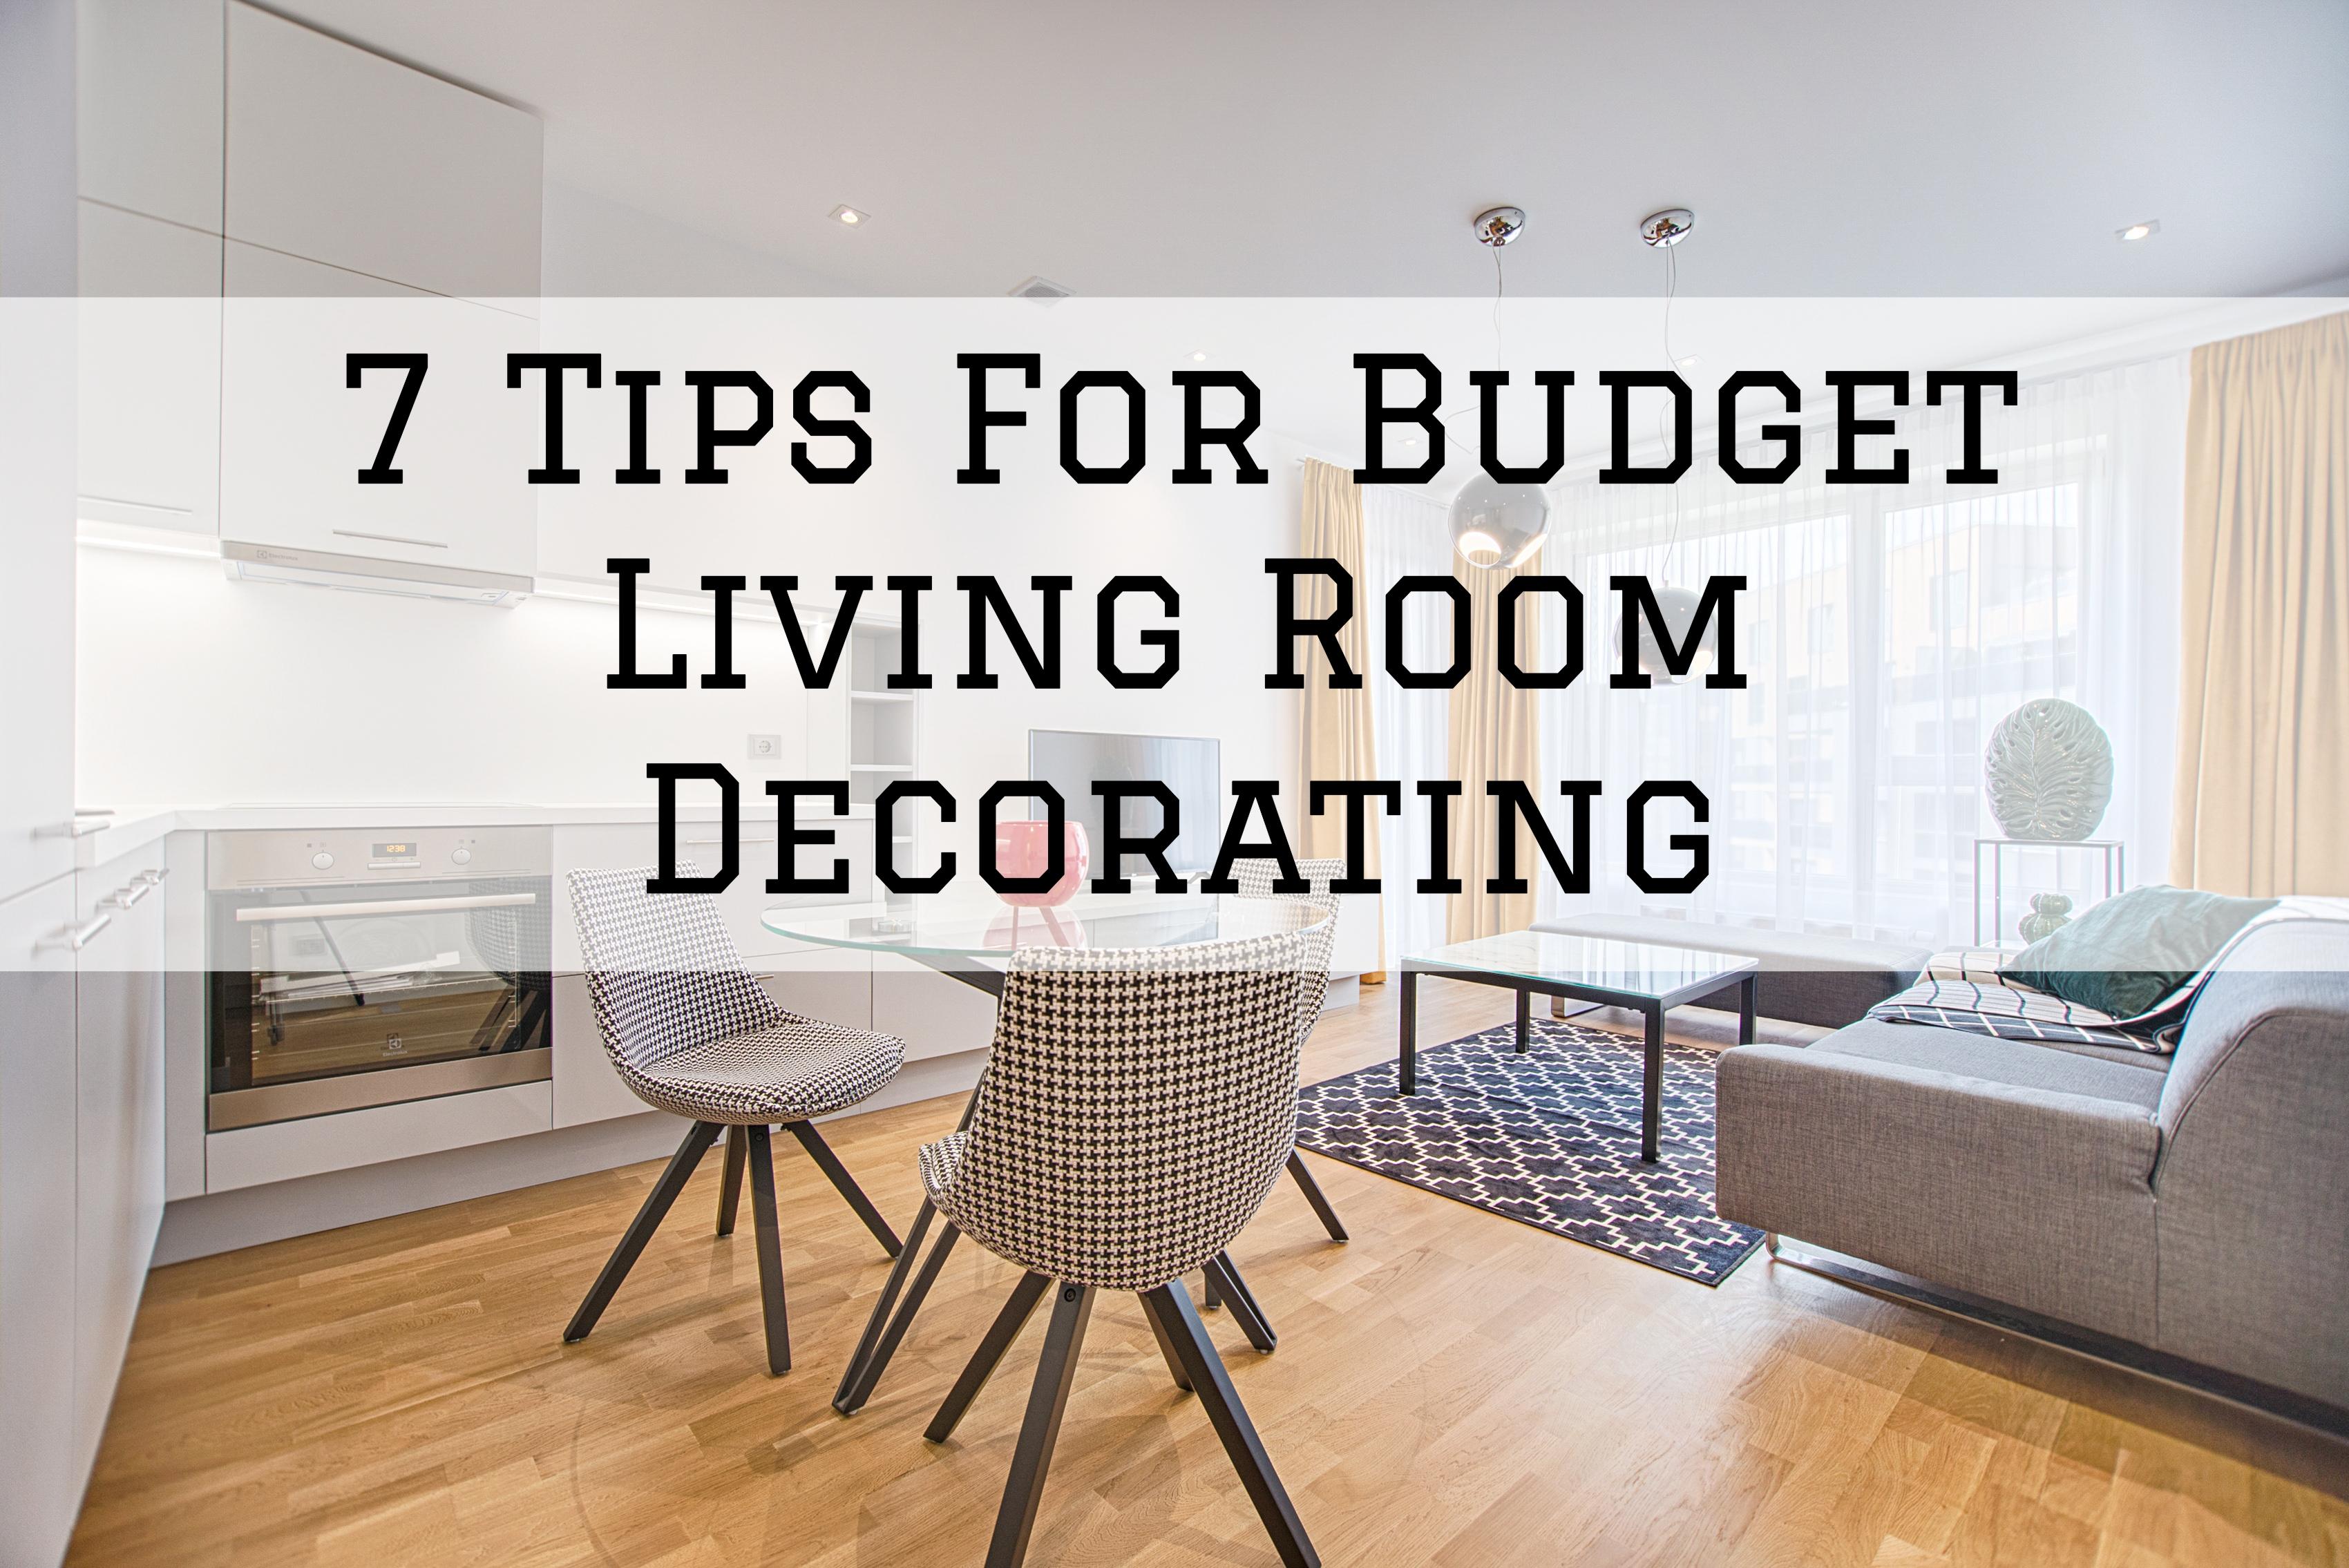 2021-07-16 Selah Painting St. Louis MO Budget Living Room Decorating